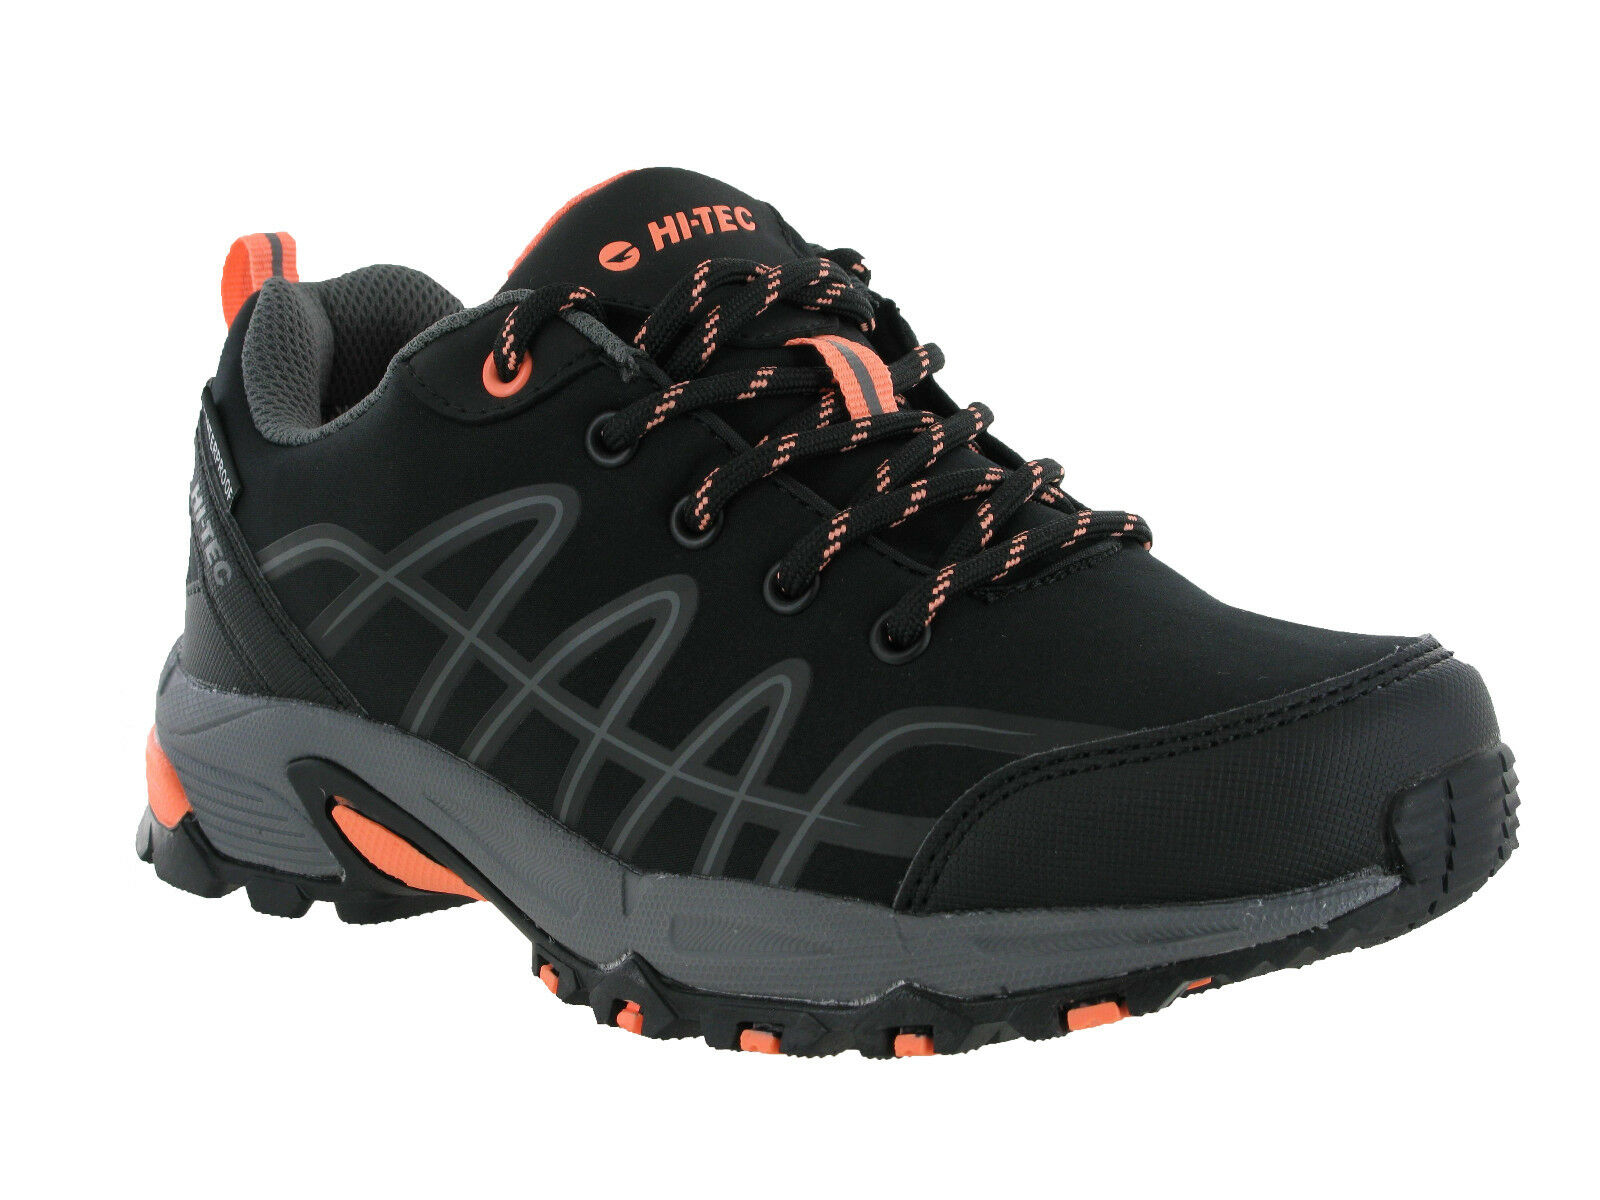 Hi-Tec Corvus Low Womens Waterproof Multi-Sport shoes UK4-8